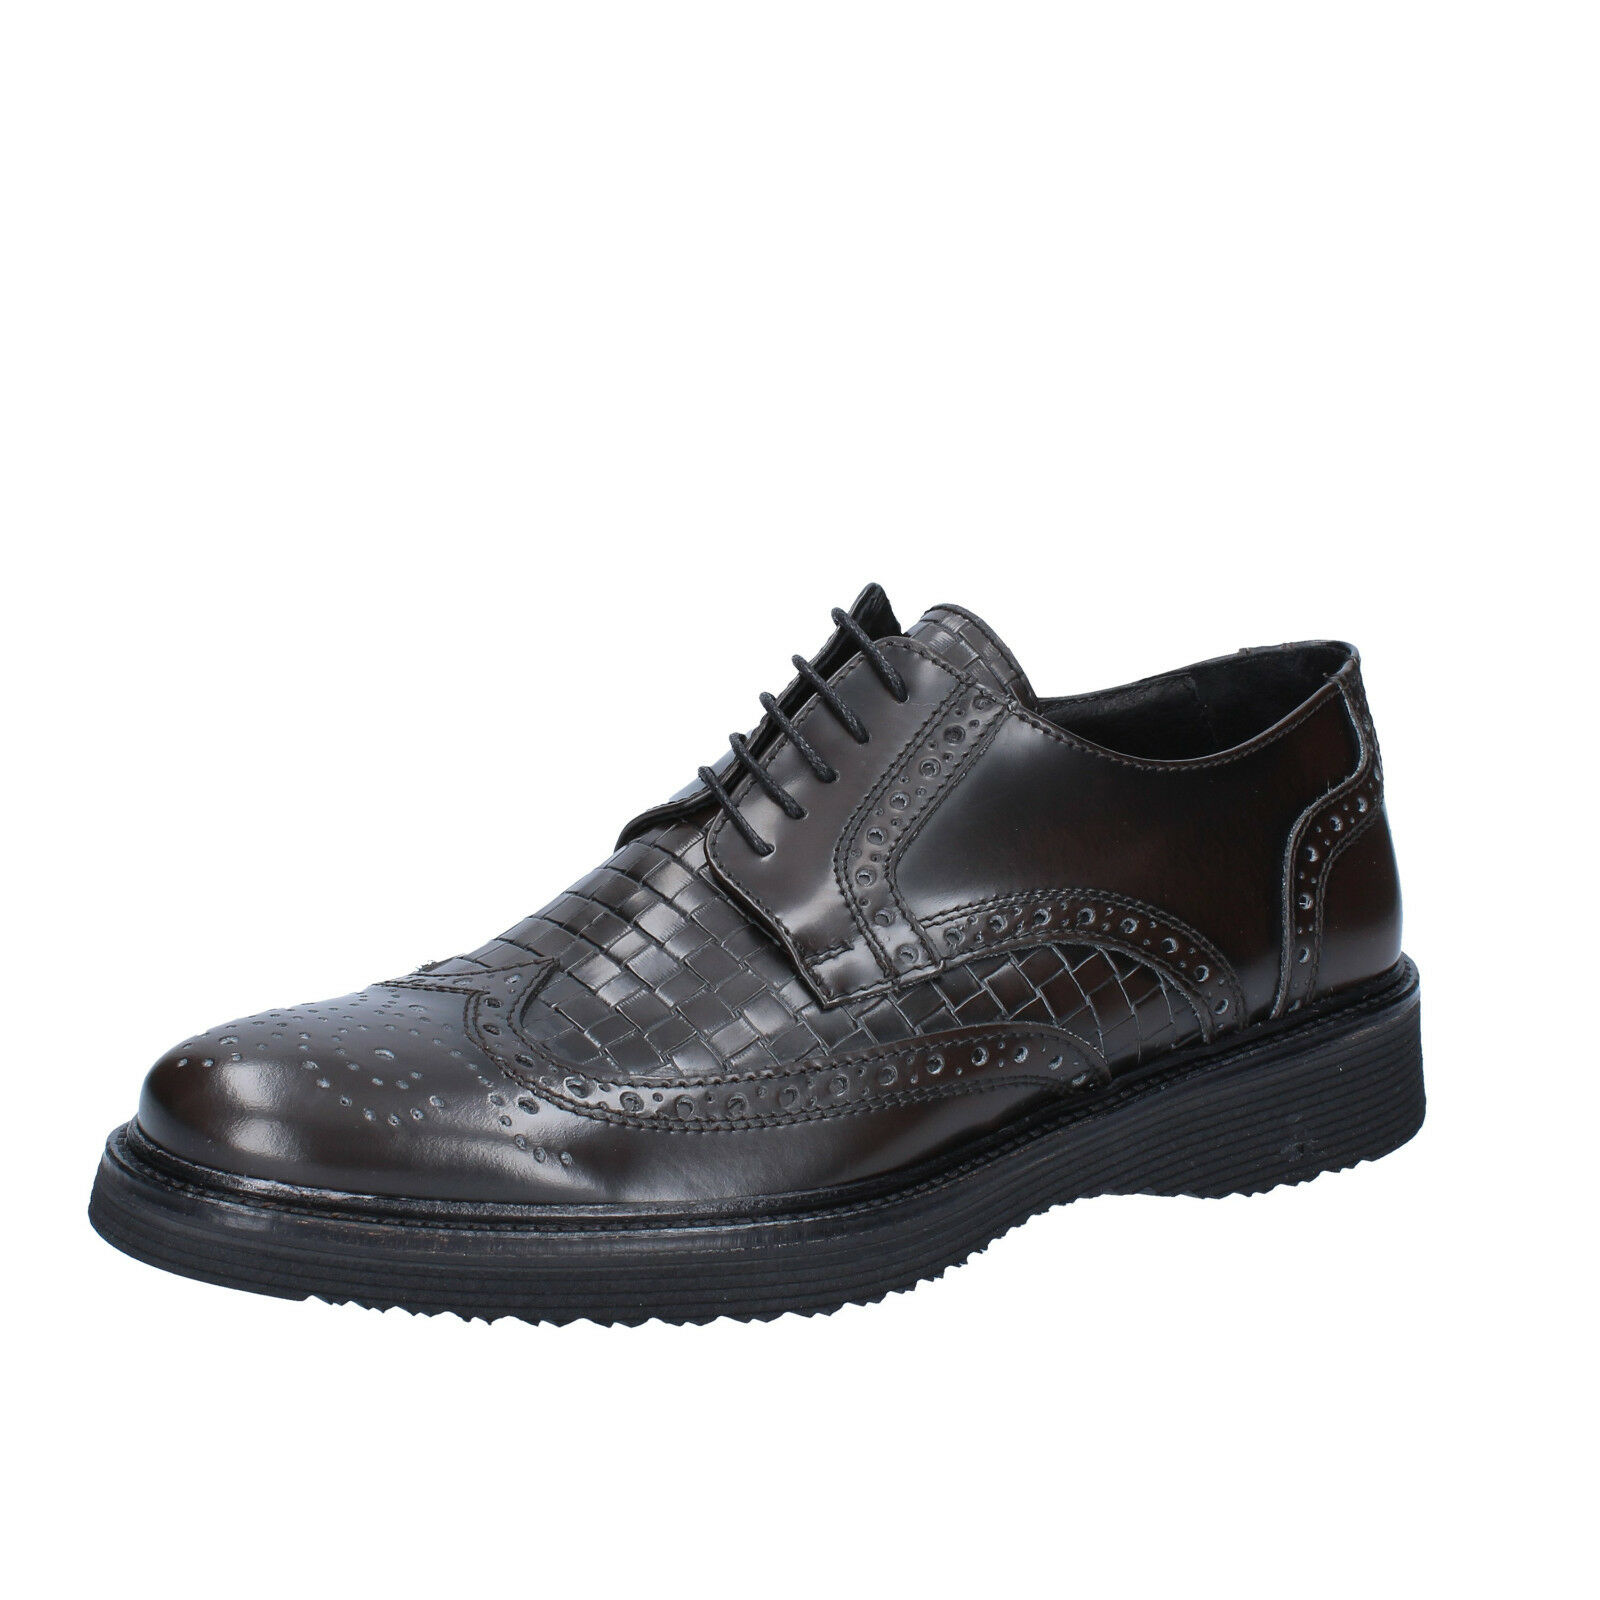 Mens shoes SALVO BARONE 8 ( EU 42 ) elegant brown shiny leather  BZ148-D